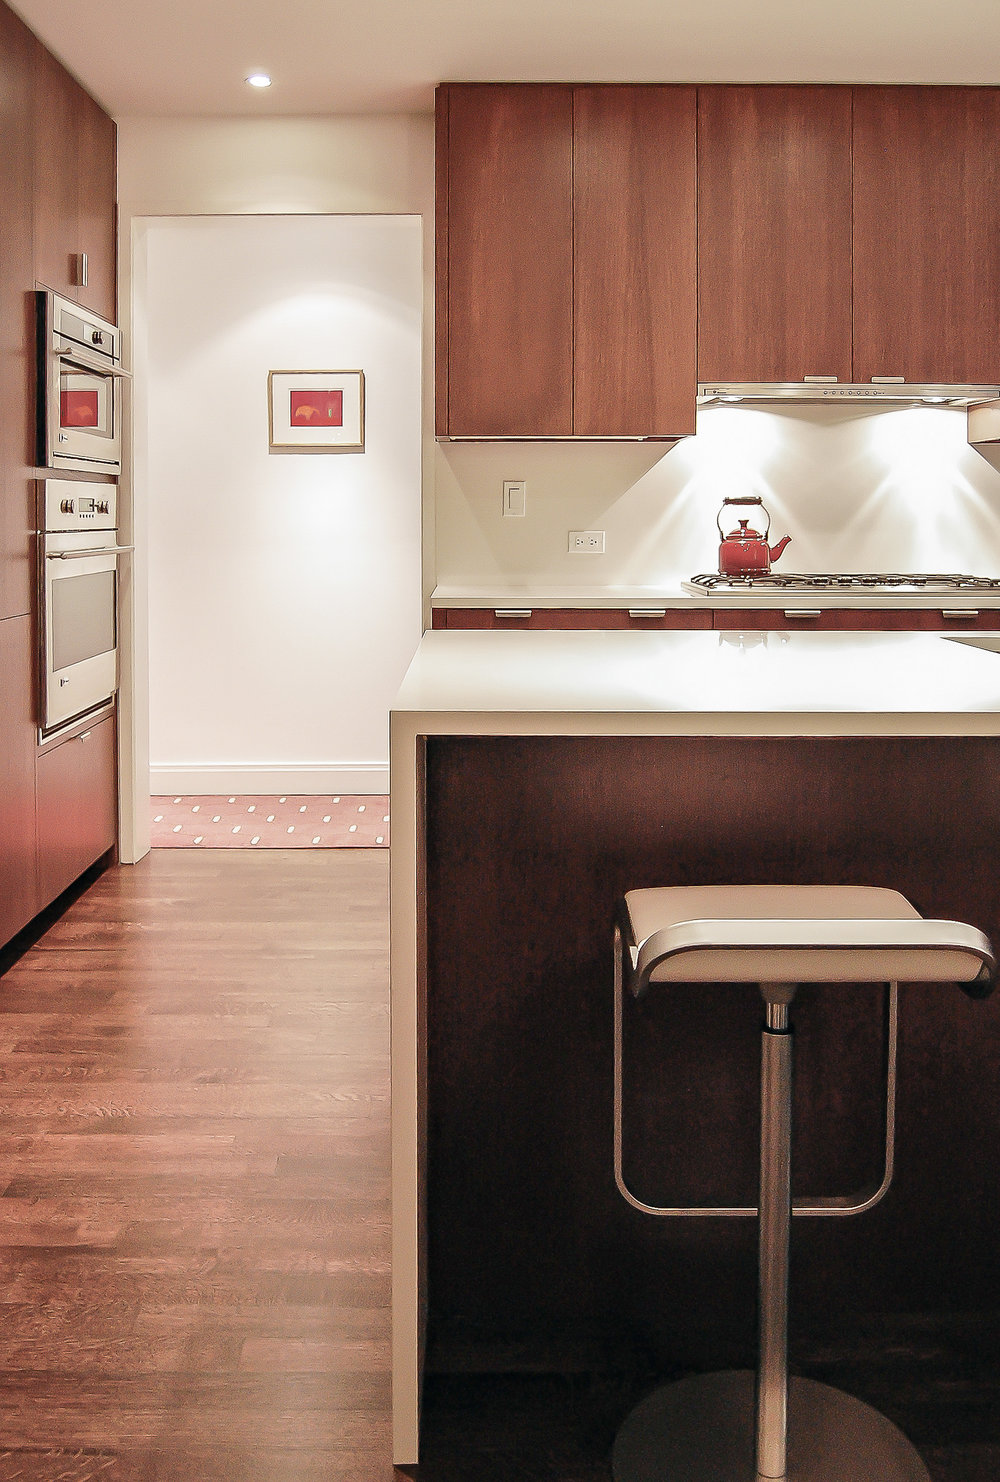 Gav 1 - Kitchen Detail.jpg